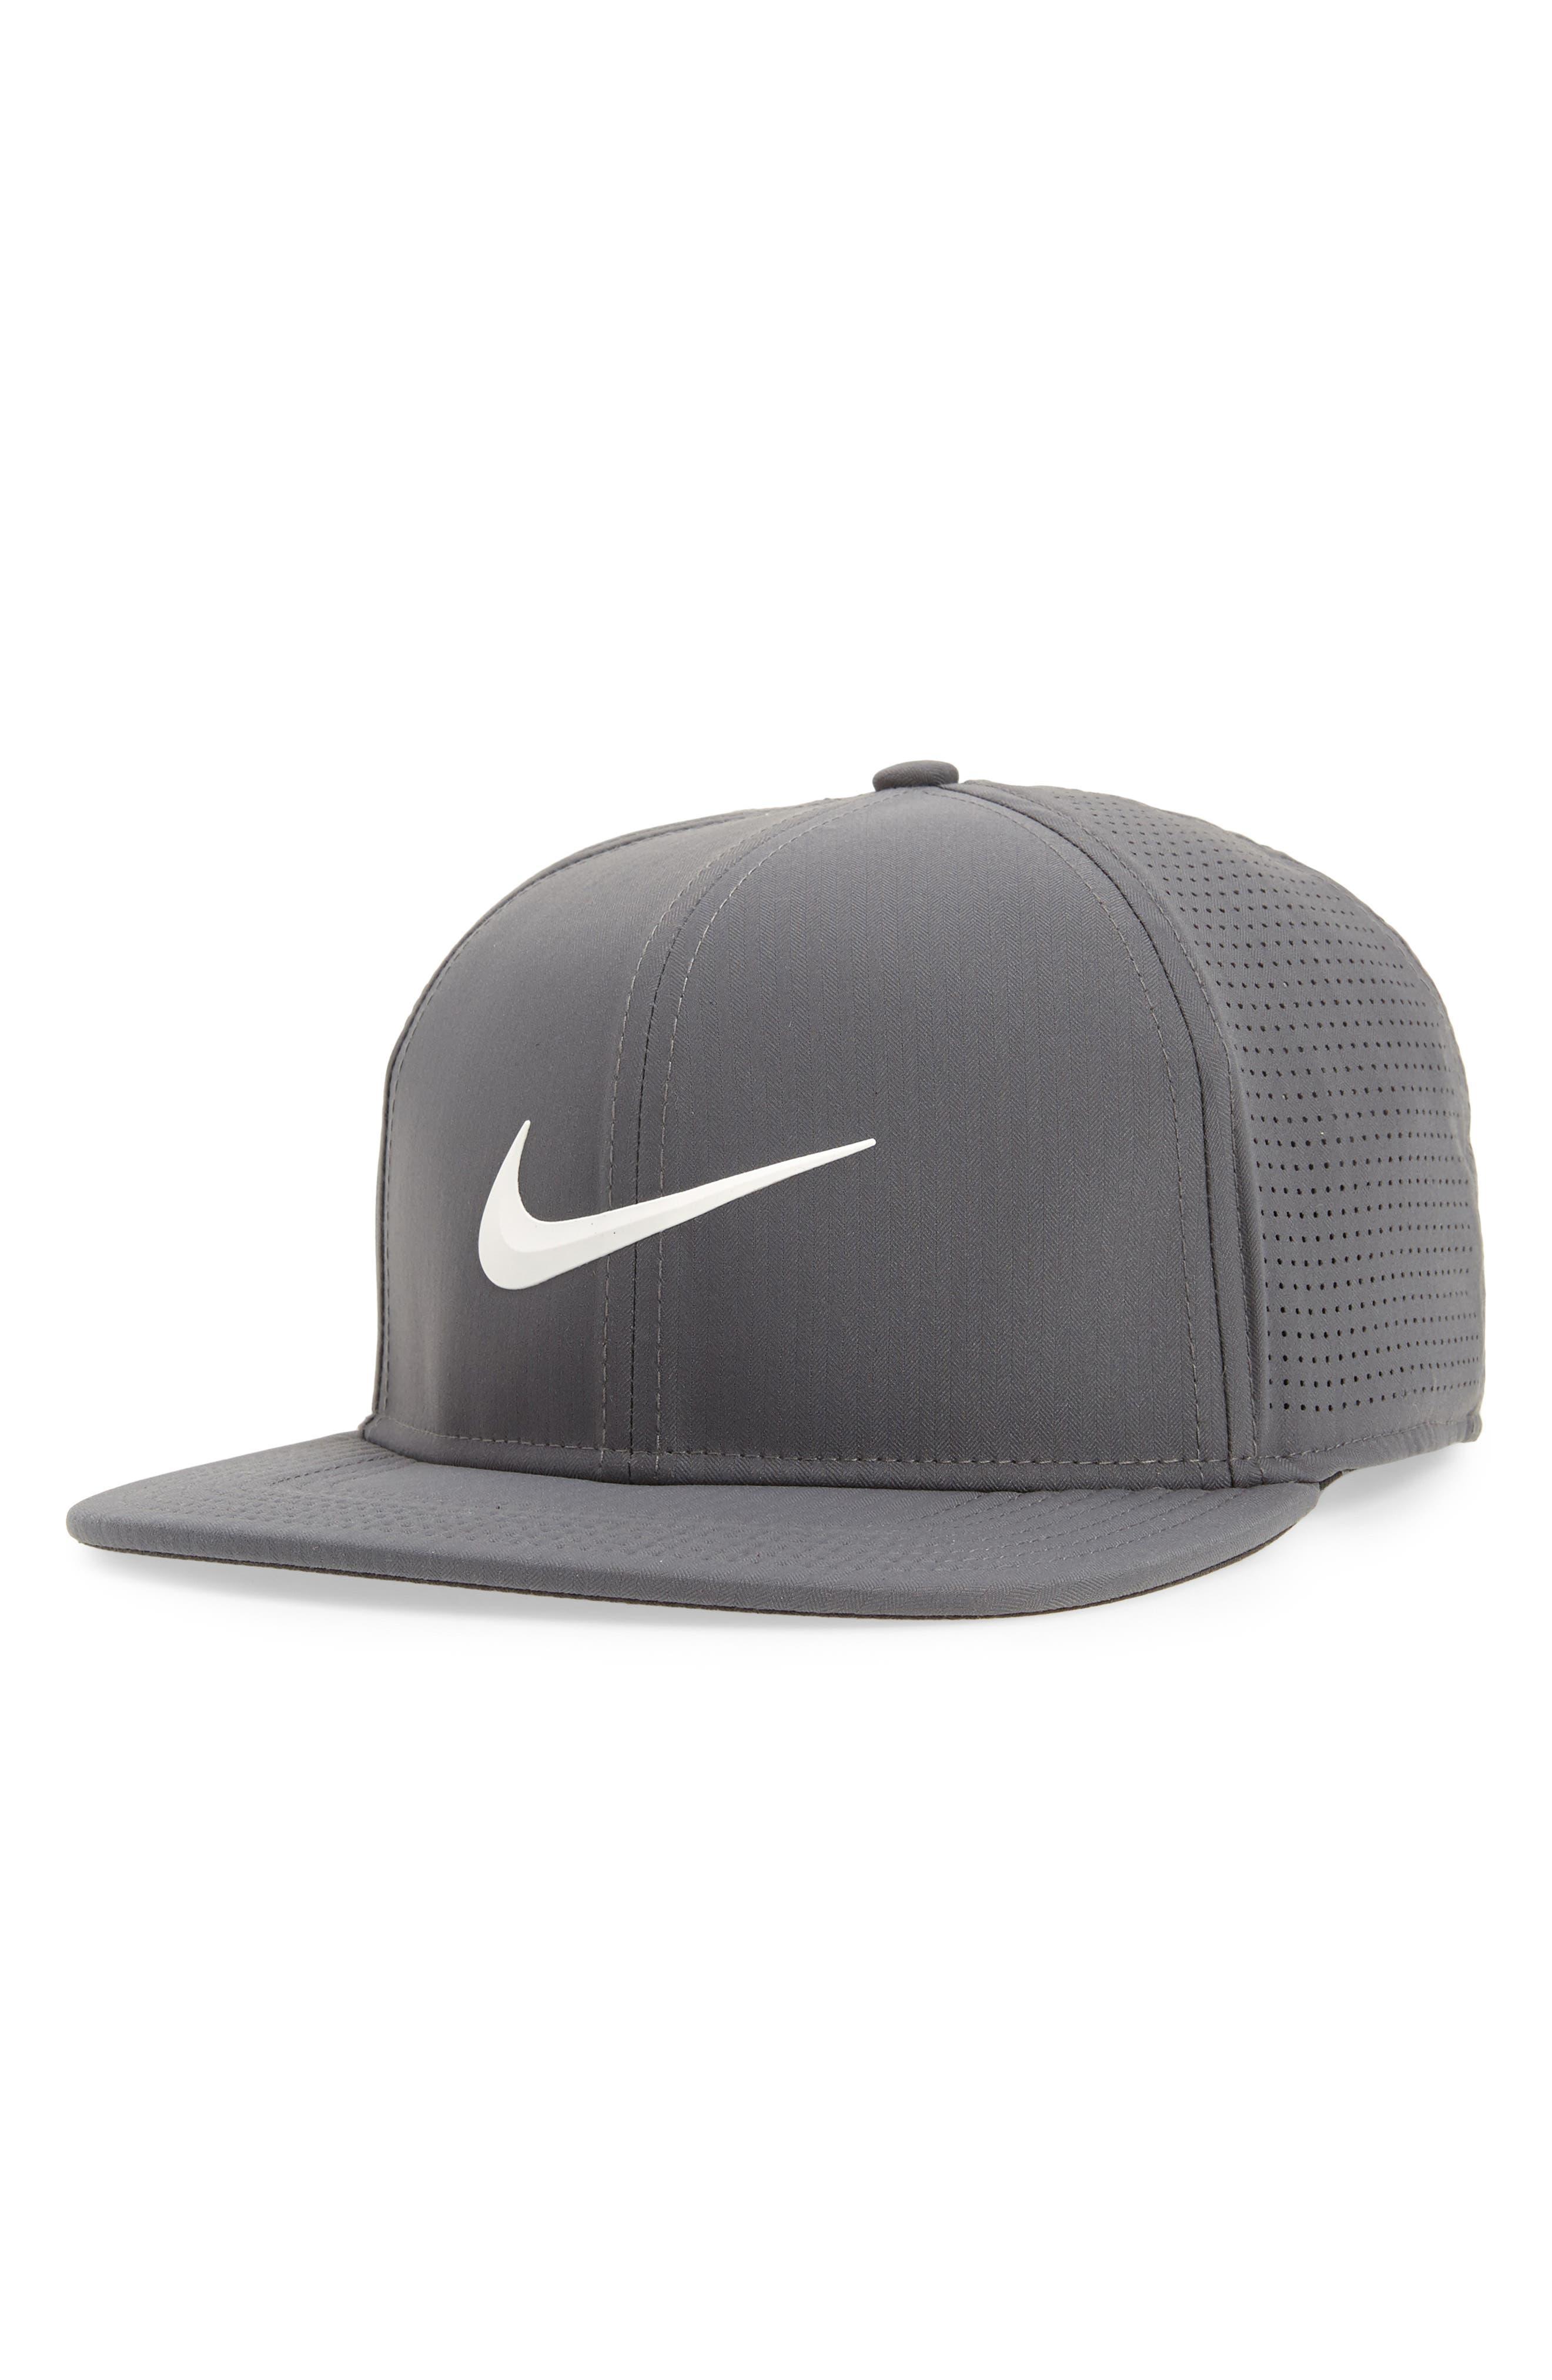 AeroBill Dry Golf Hat,                         Main,                         color, Dark Grey/ Anthracite/ White